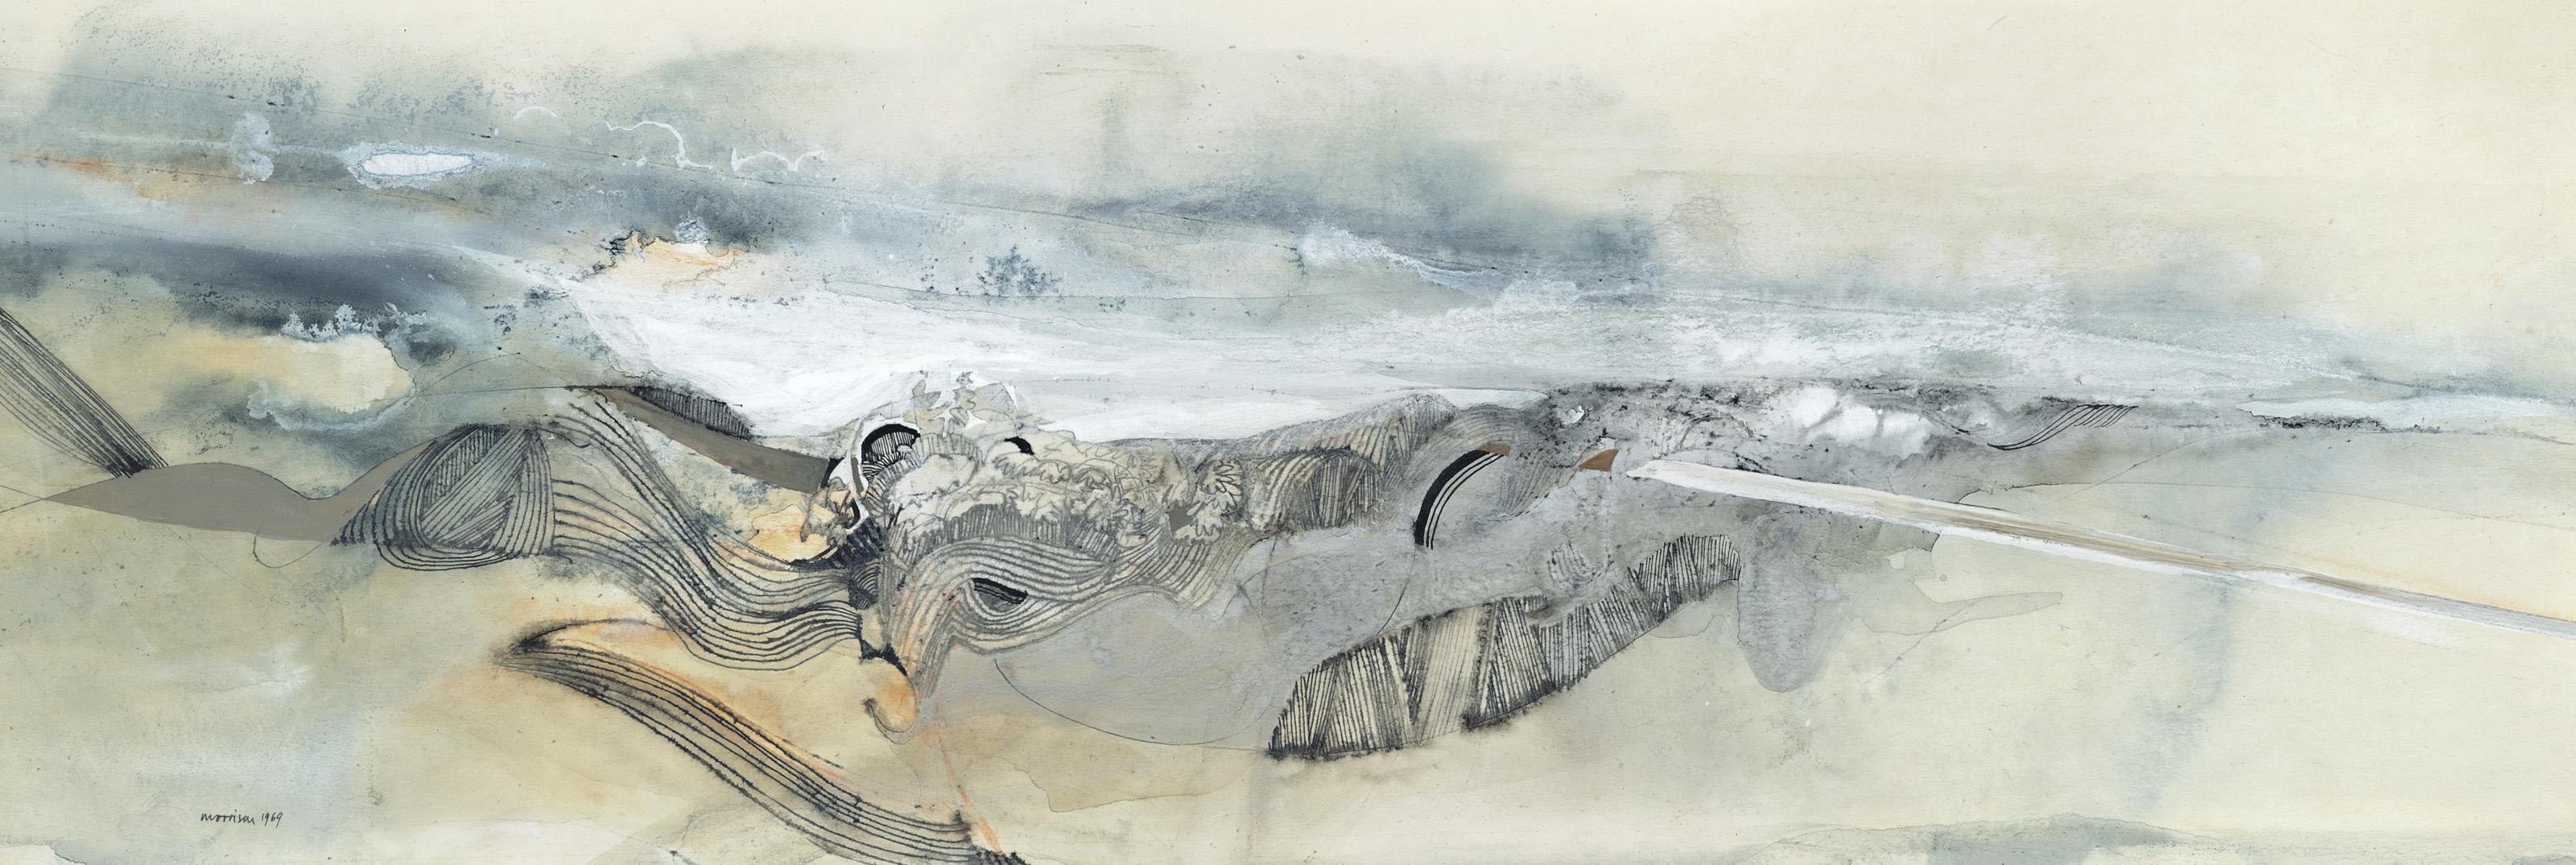 James Morrison Paintings For Sale